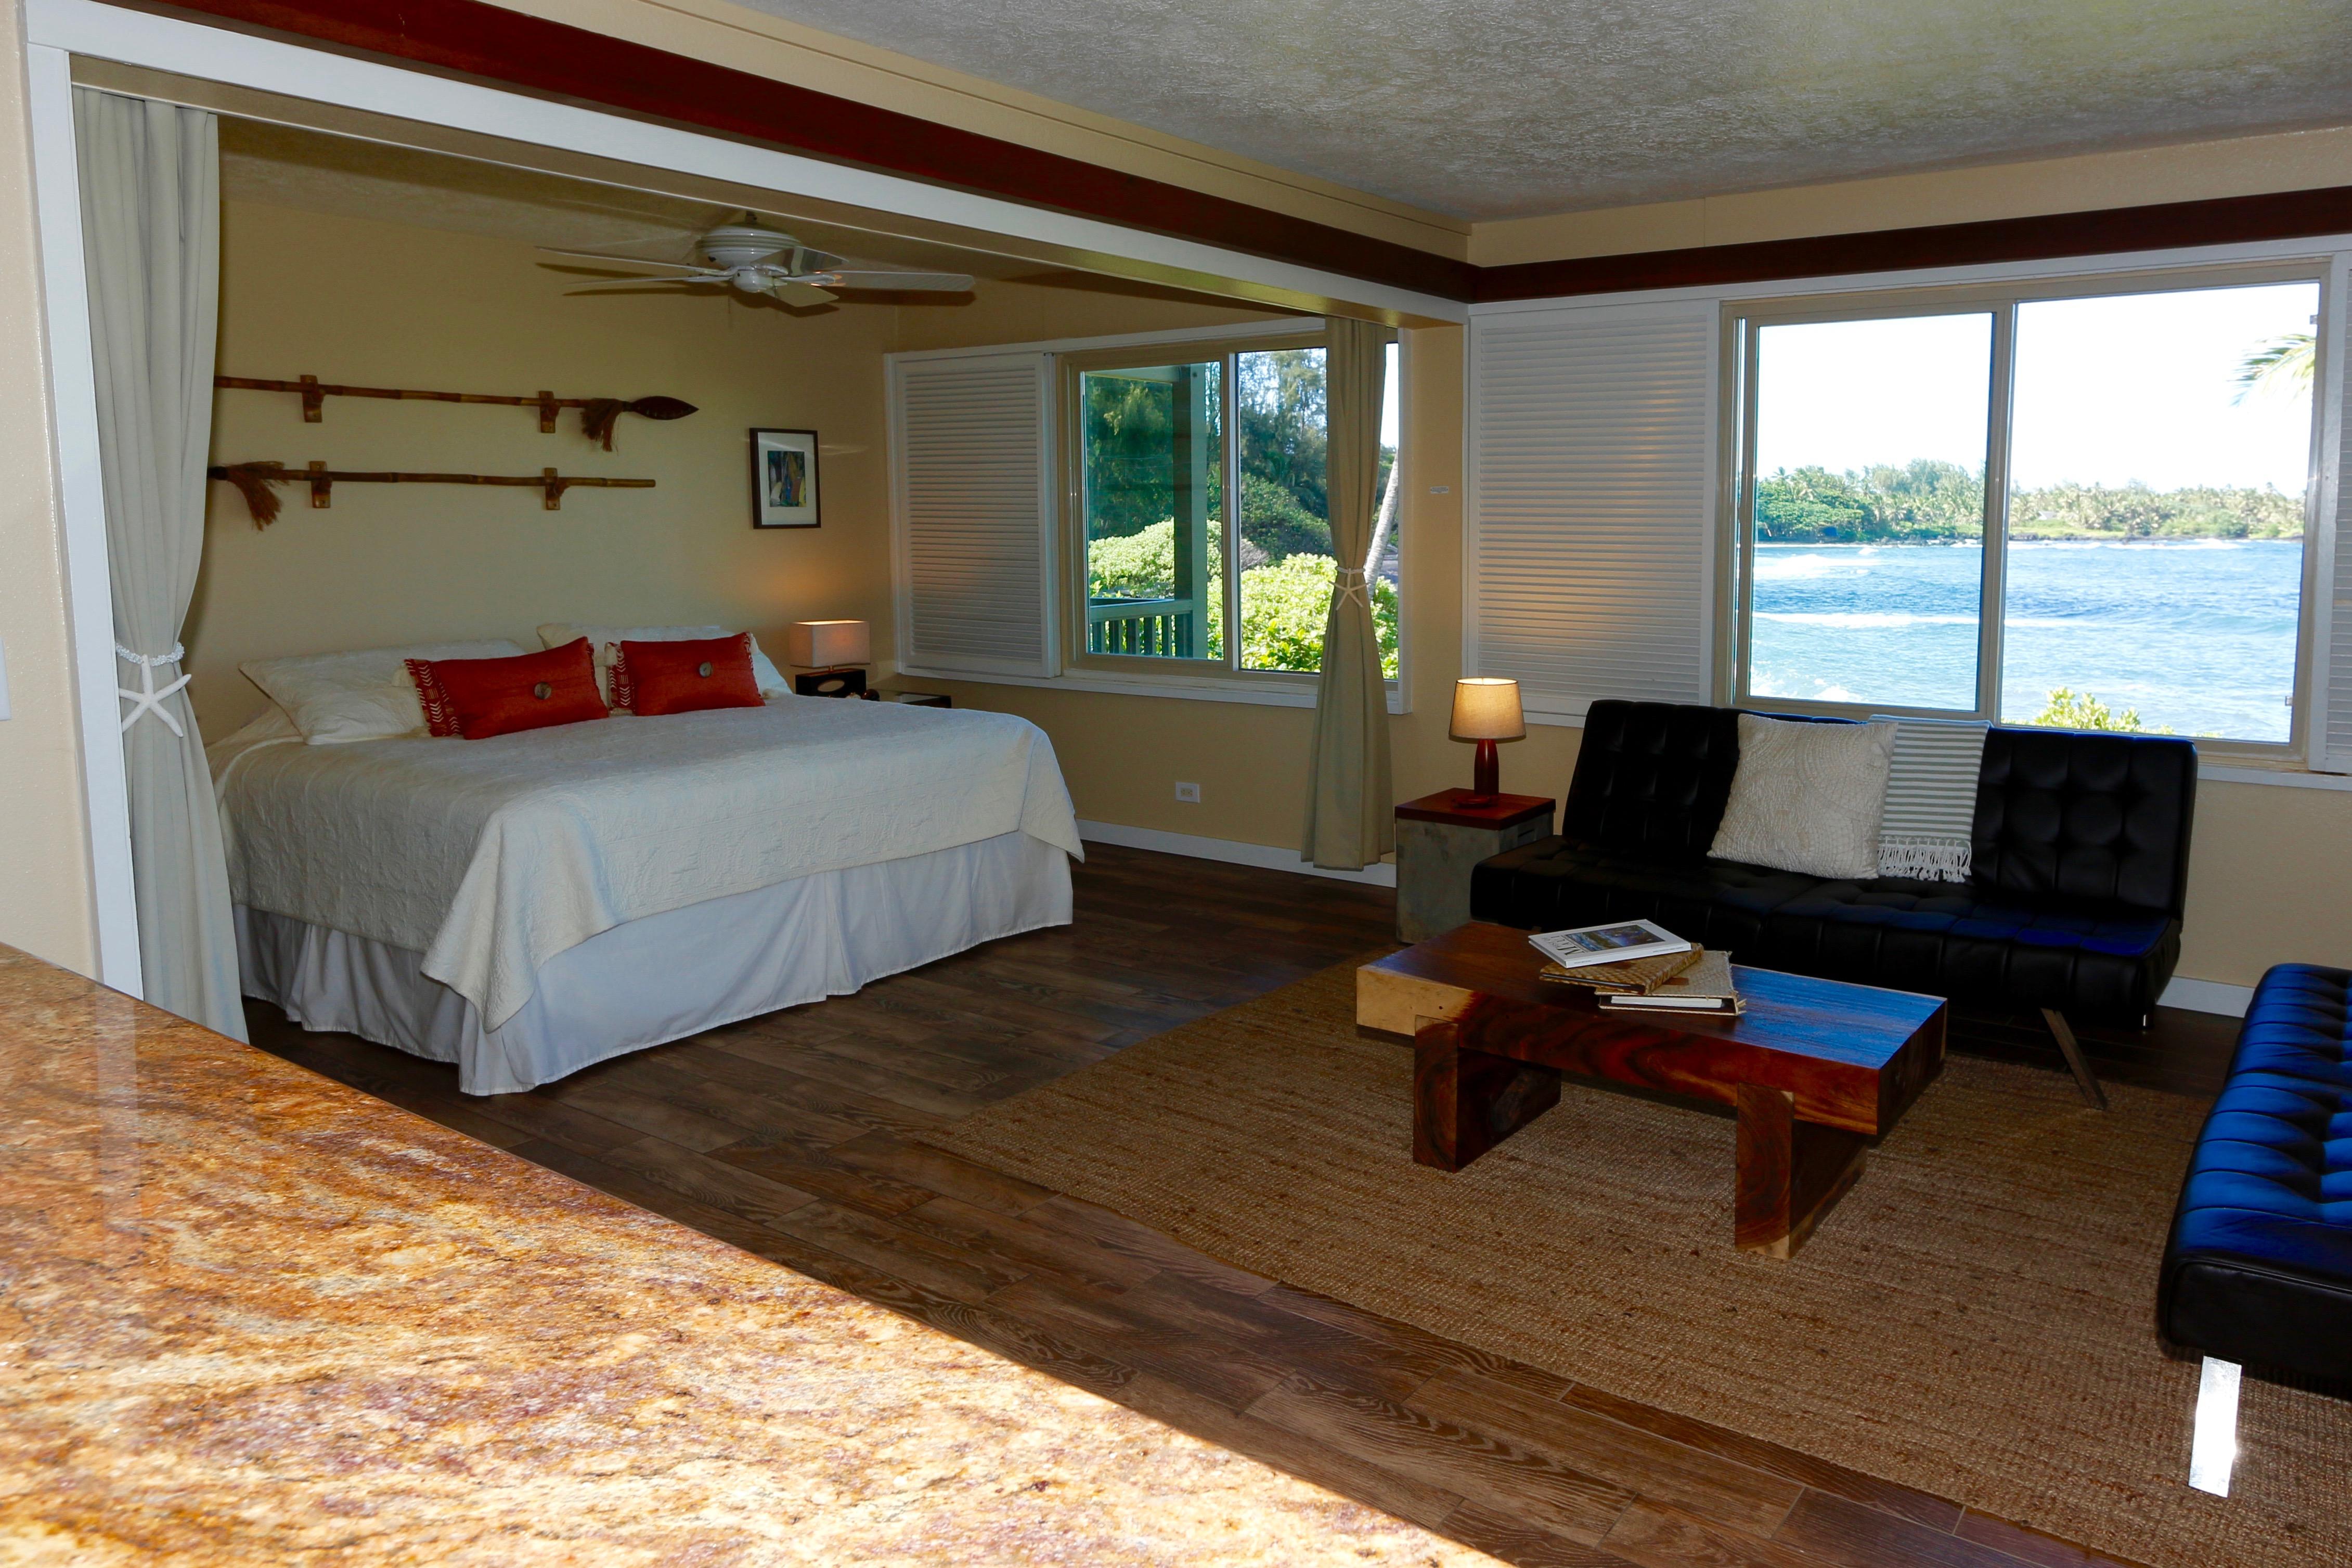 3 Bedroom Suites In South Beach Miami 28 Images Http Www Vogue Com Au Vogue Living Travel